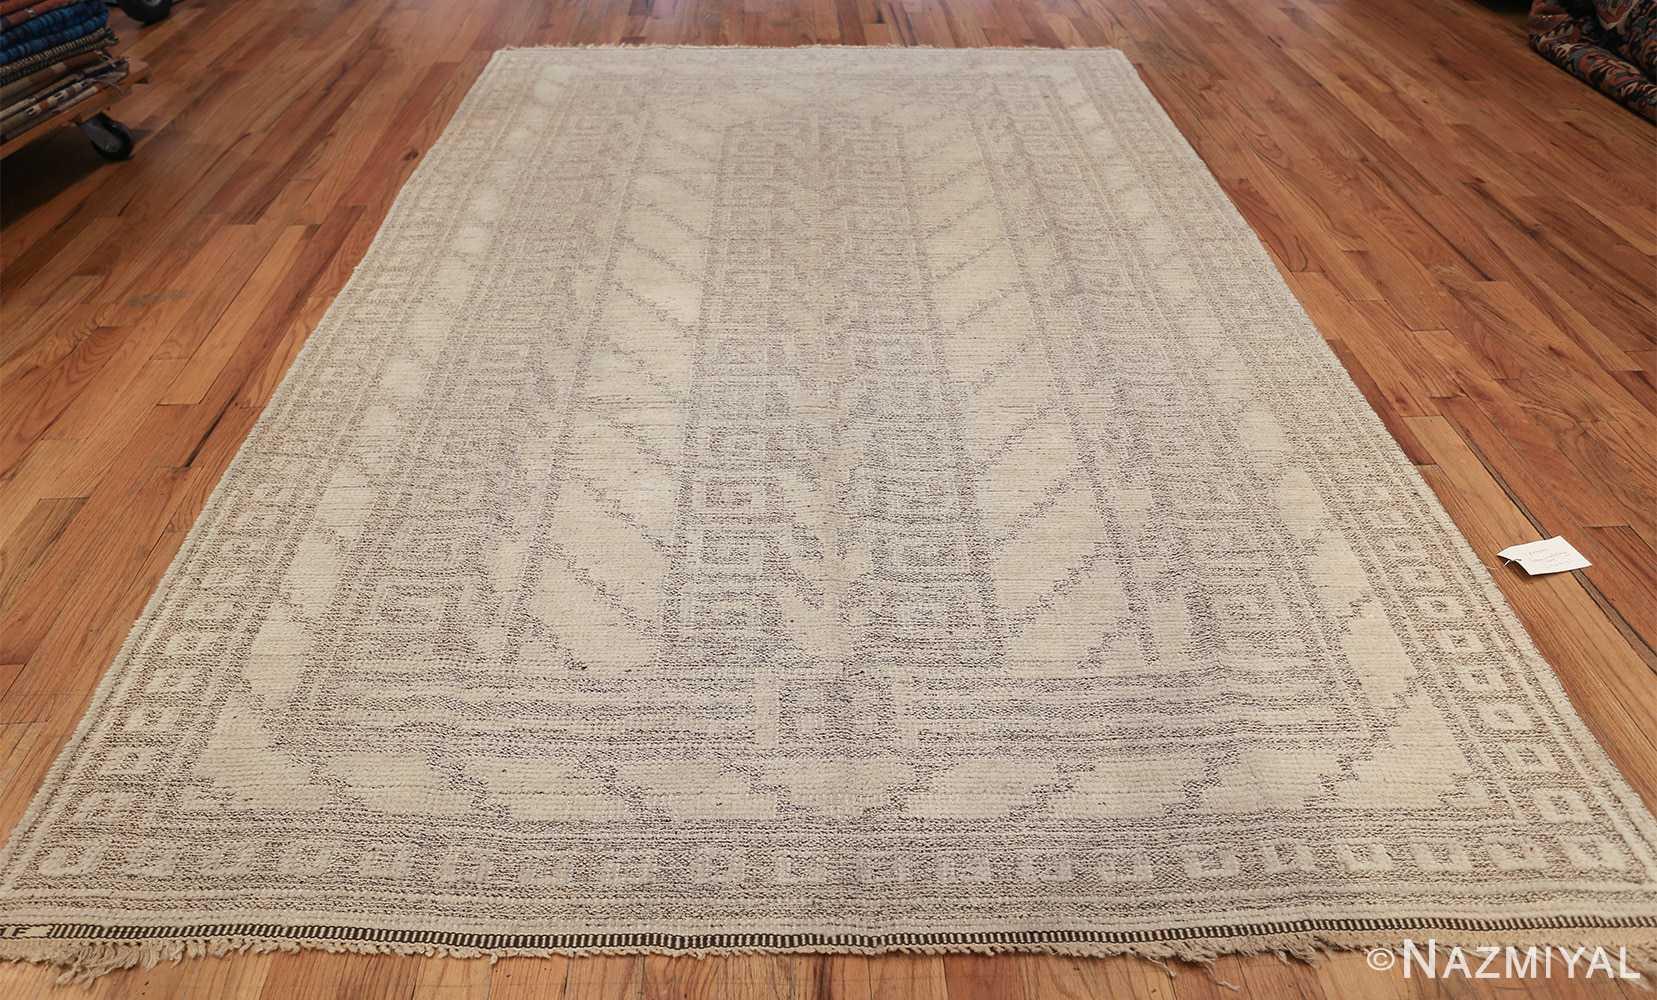 Vintage Swedish Scandinavian rug by Marta Maas 48830 whole Nazmiyal